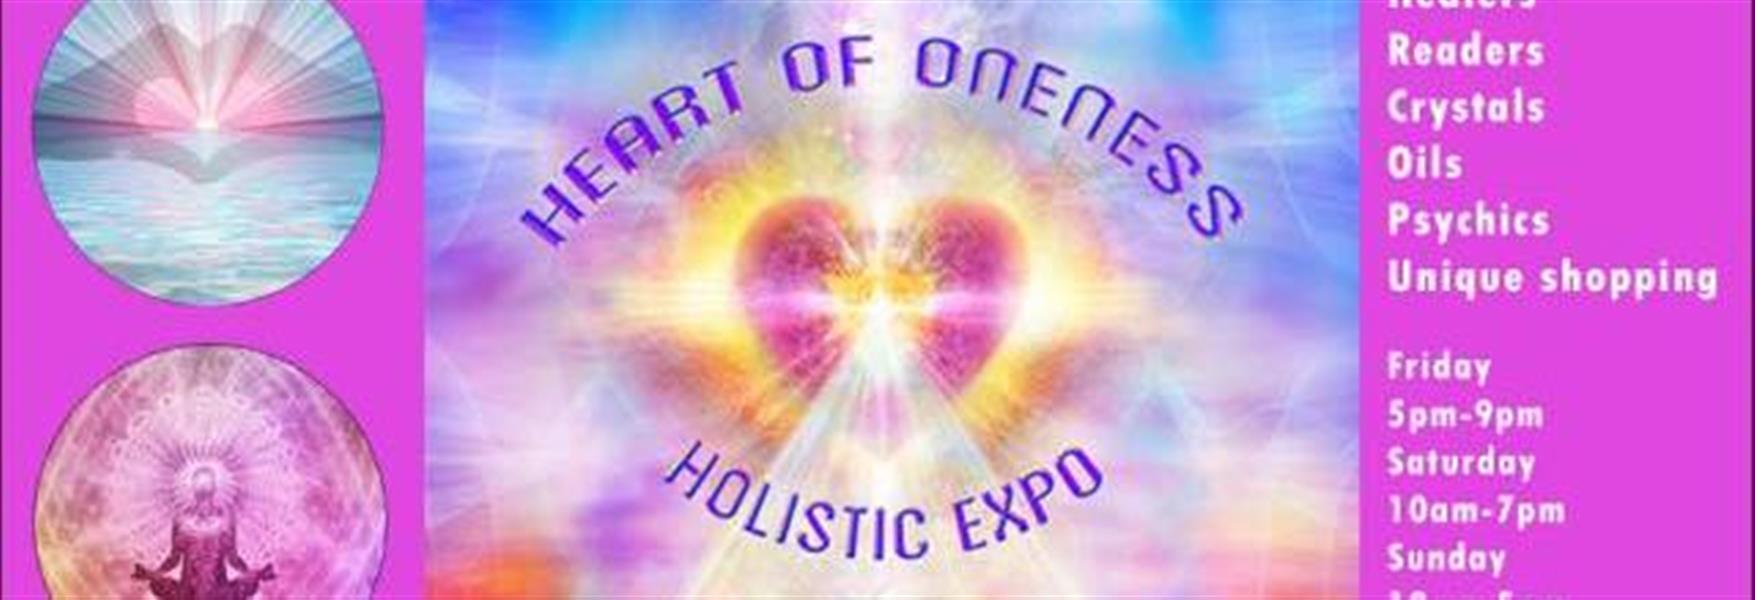 2da5b90f-4433-46c3-bac4-61ef65392717_Heart of oneness expo cover pic.jpg